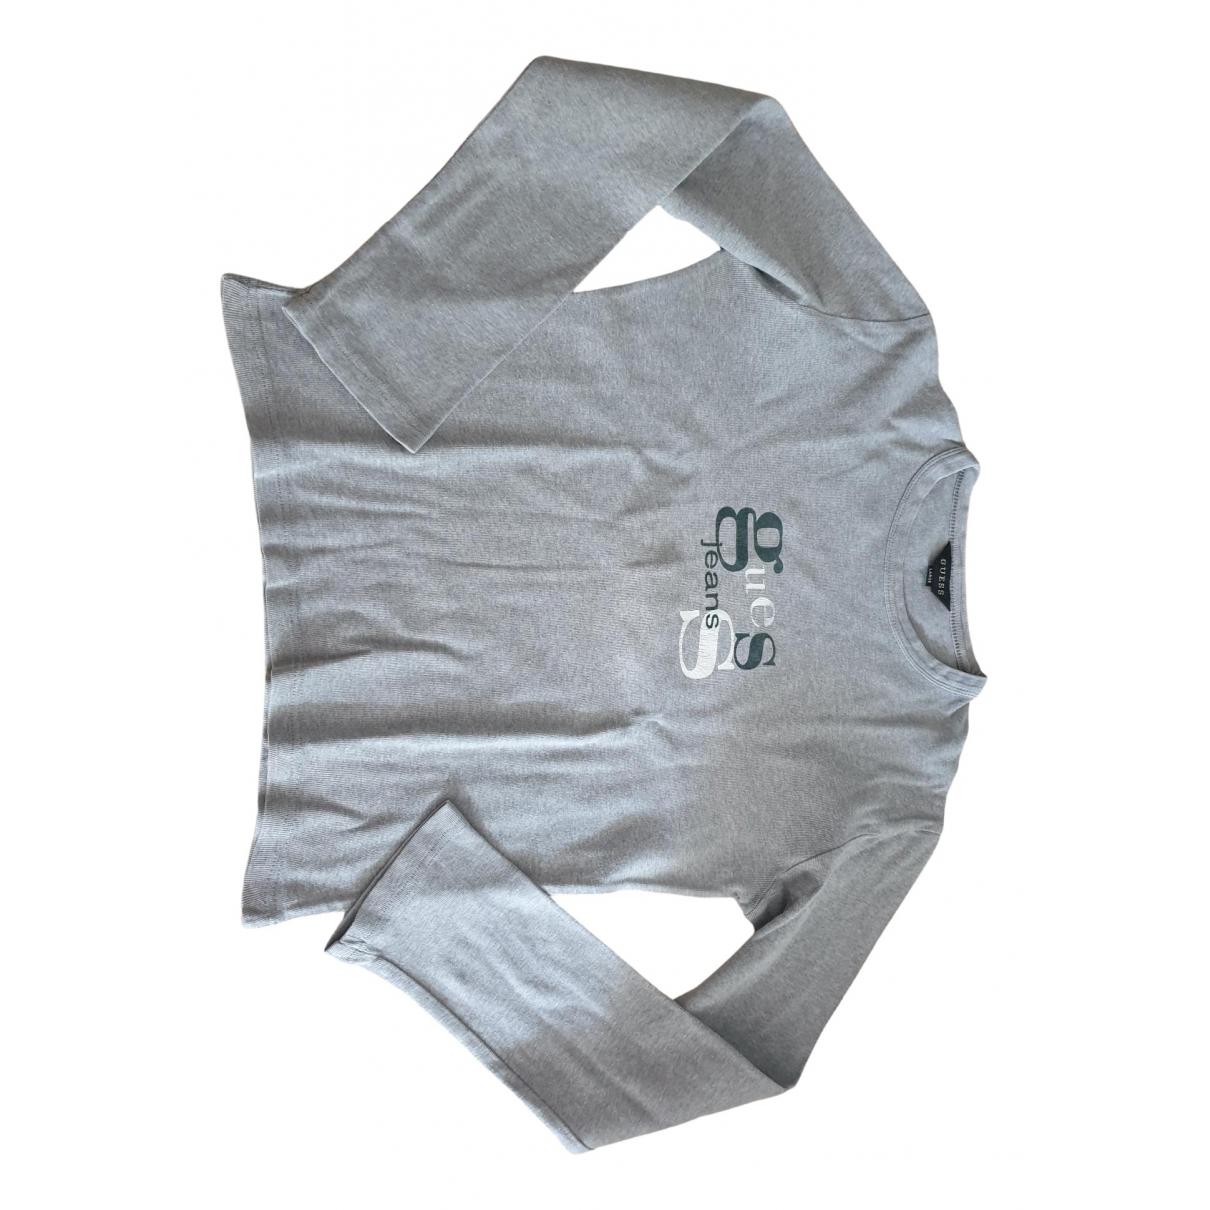 Guess \N Grey Cotton  top for Women L International